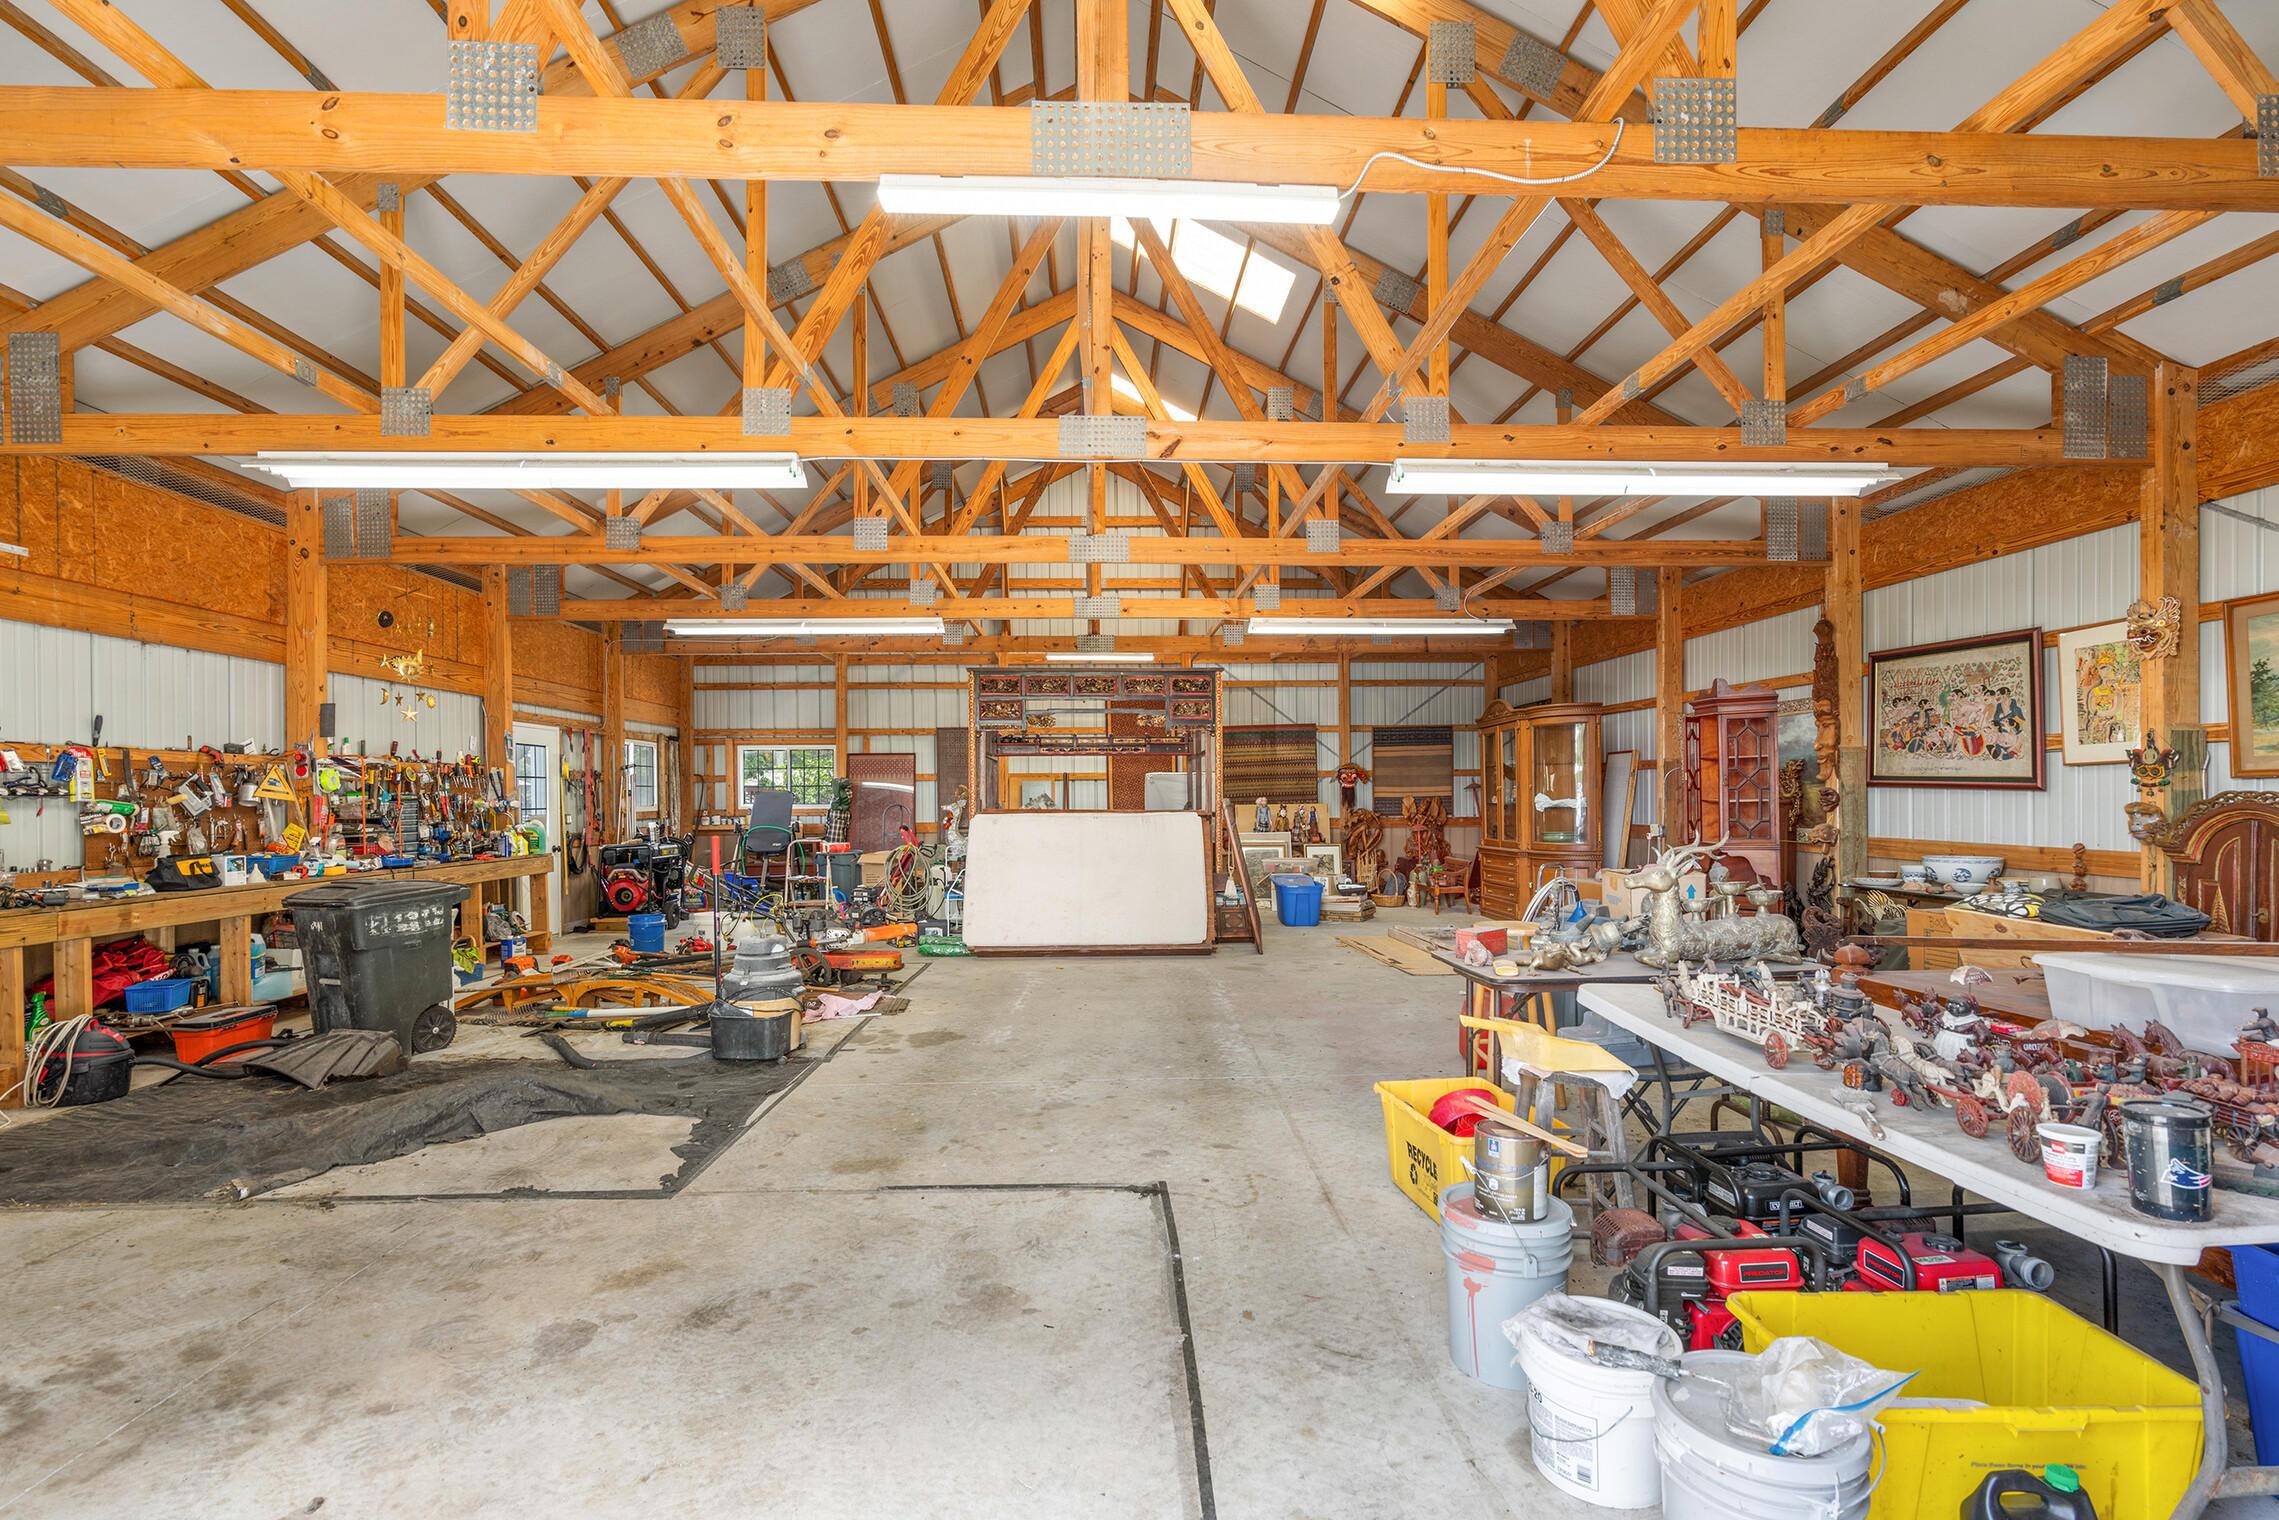 Equipment building